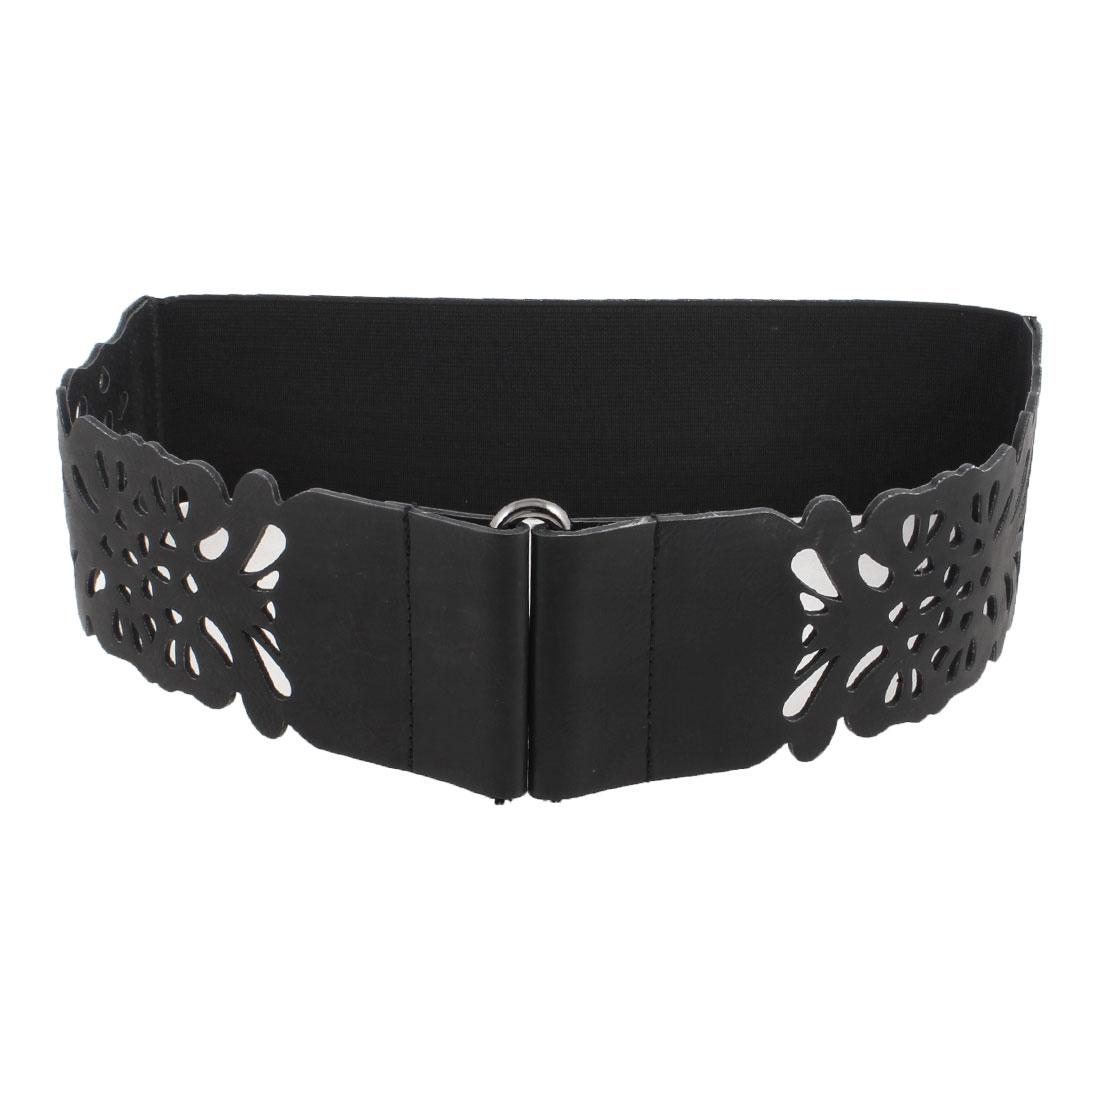 Women Metal Interlocking Buckle 7cm Width Trousers Waistband Waist Belt Black